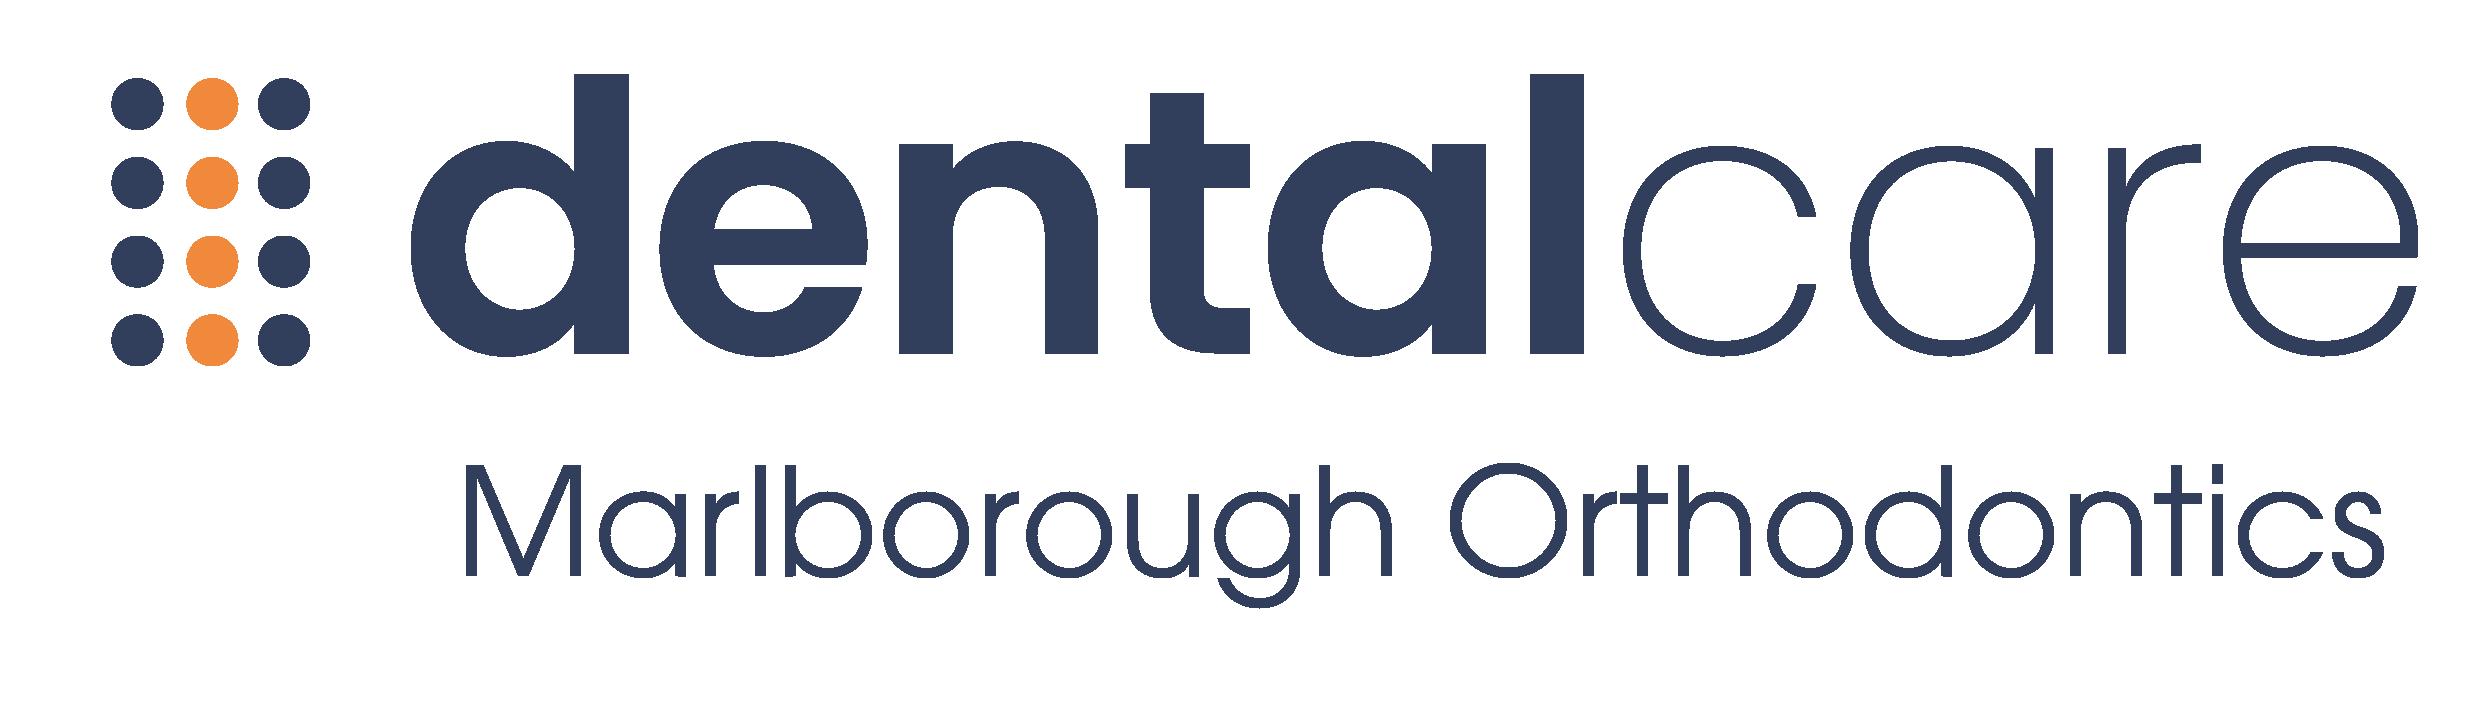 Marlborough Orthodontics